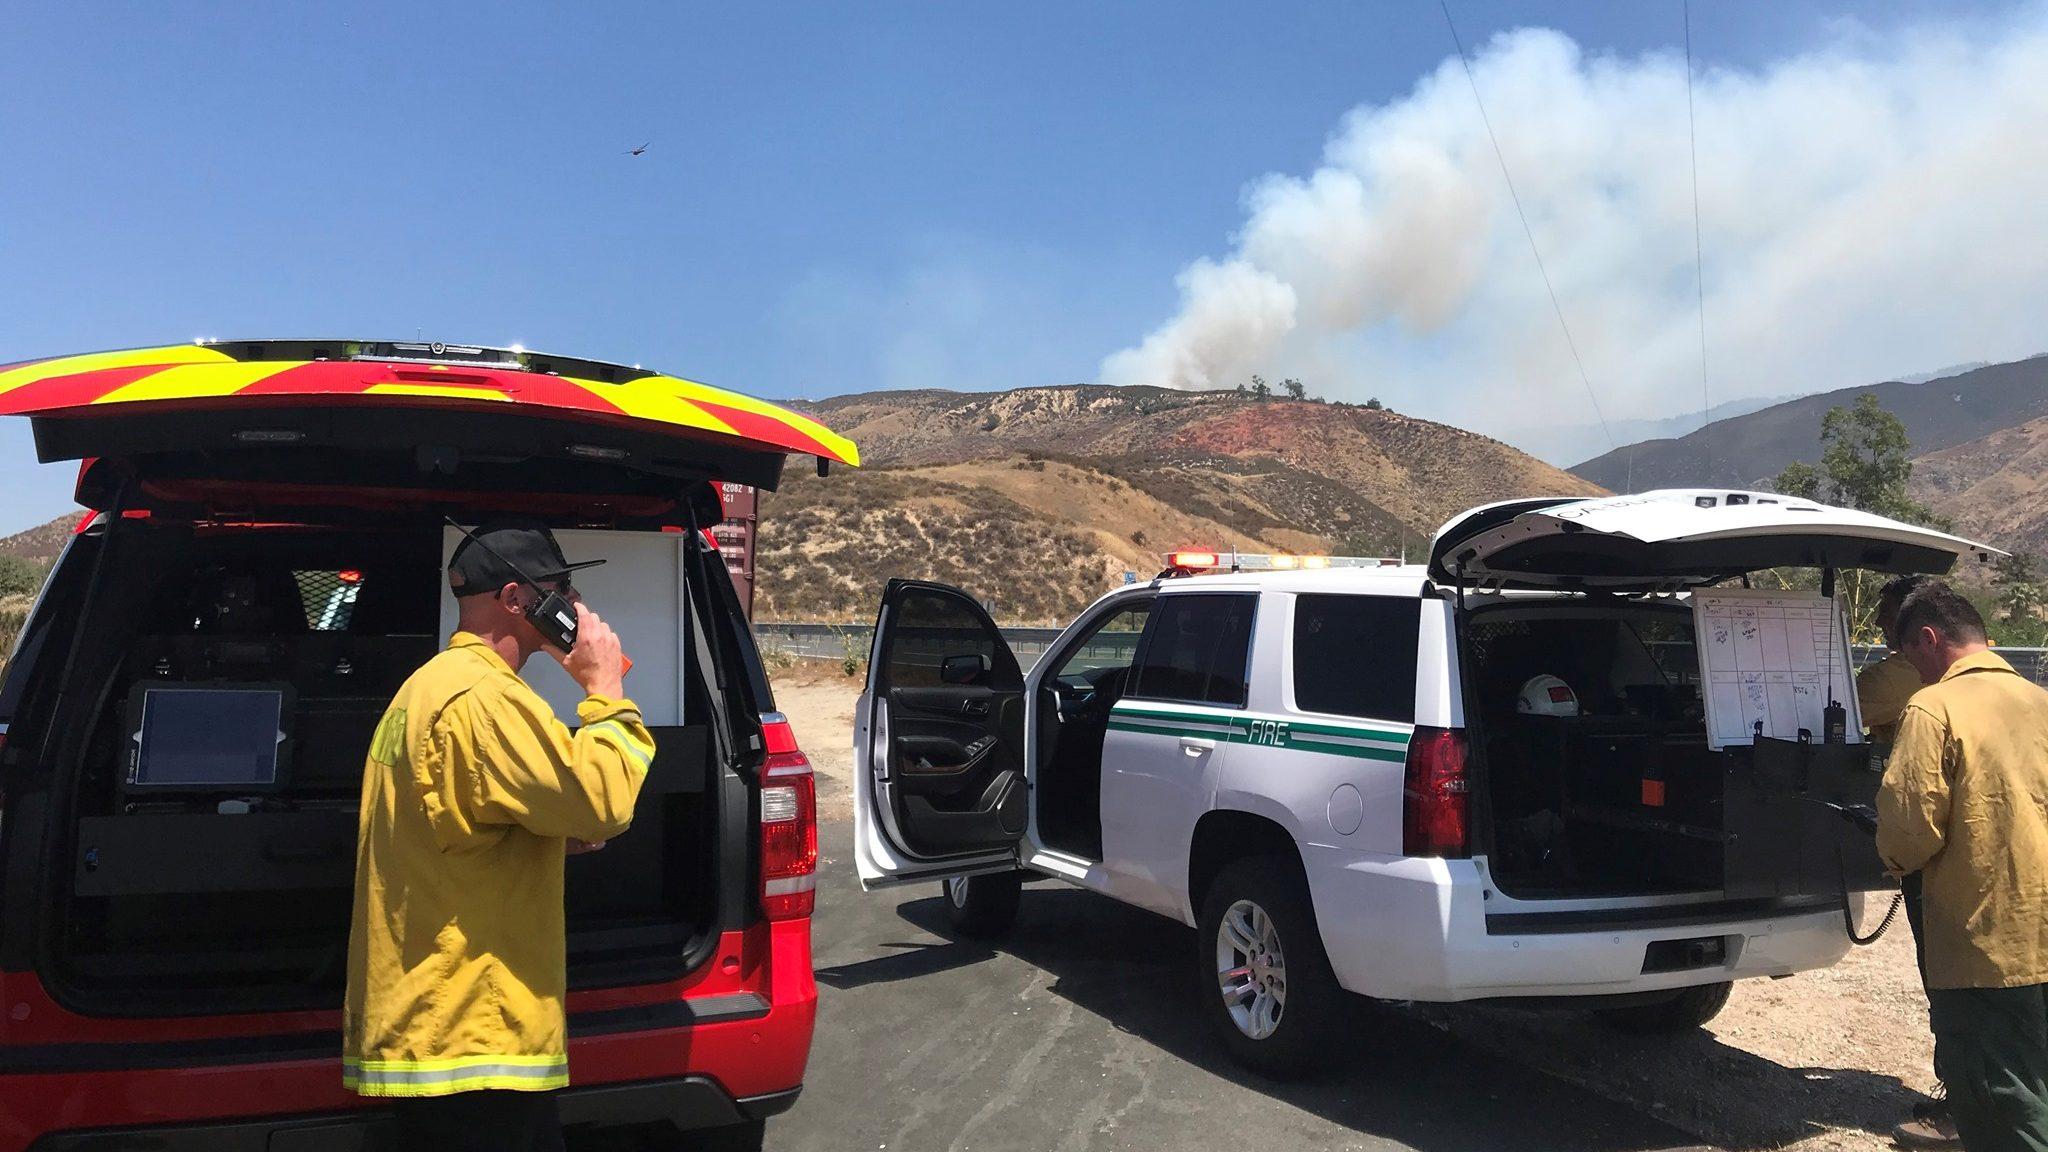 Peak Fire's rapid spread near San Bernardino prompts Highway 18 closure; firefighter injured.